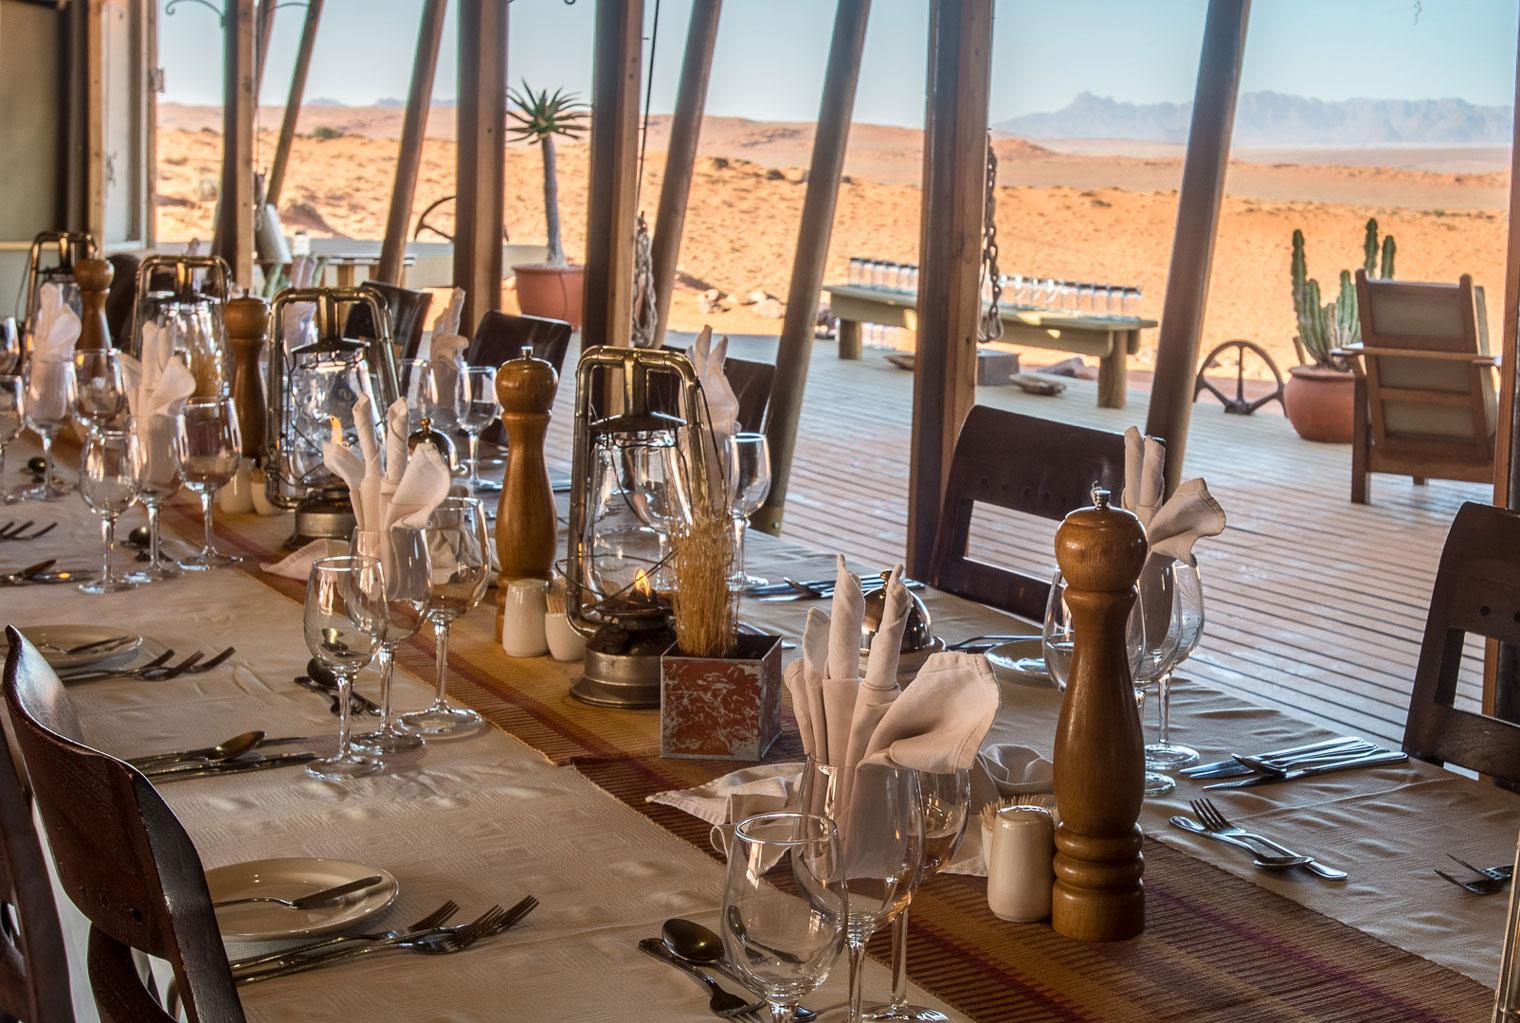 Wolwedans-Dune-Camp-Namibia-Dining-Area